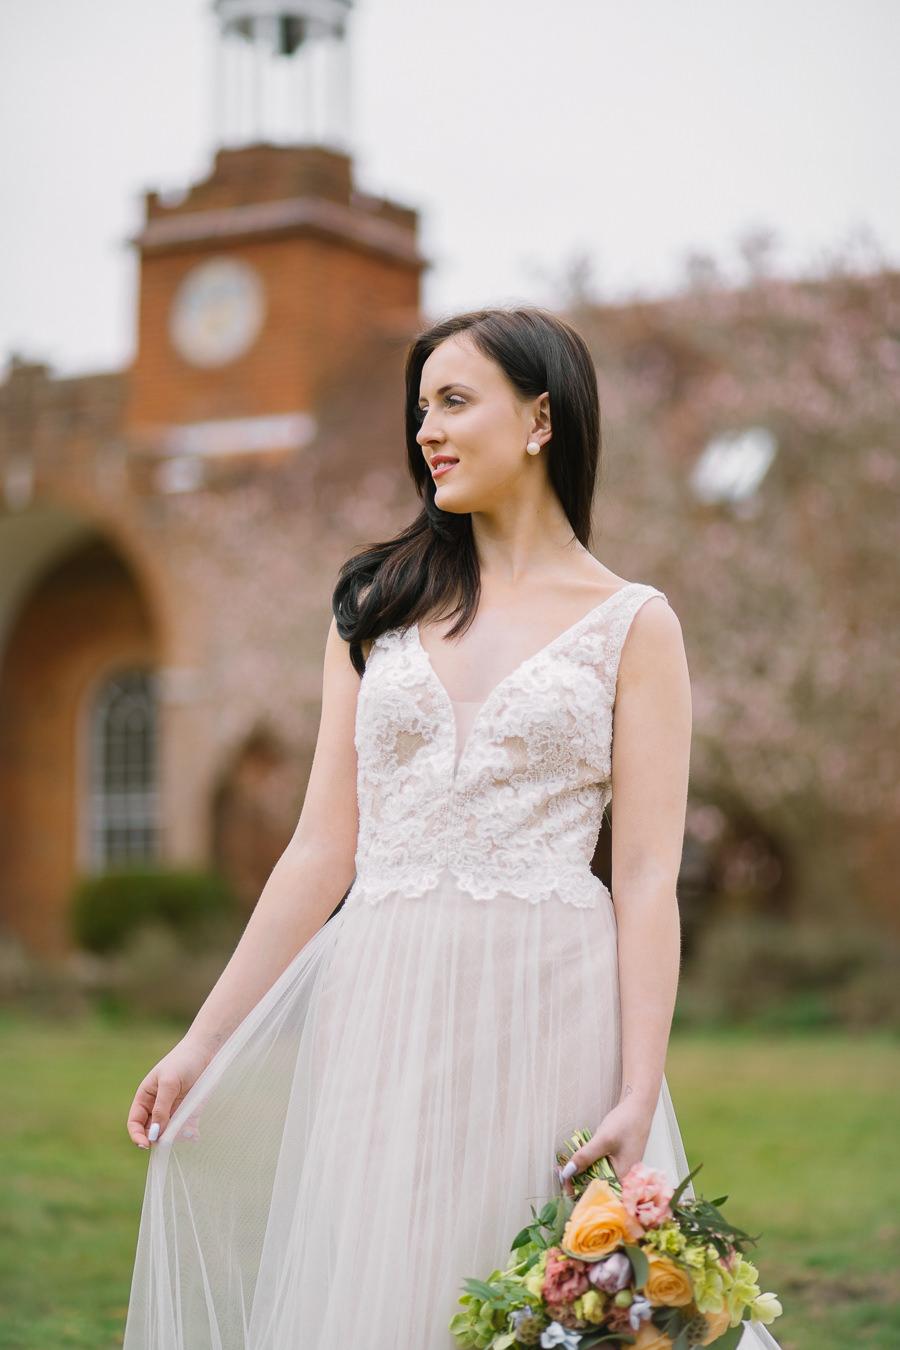 'Understated Elegance' Spring Styled Hampshire Bridal Shoot – Rownhams House, photo credit Nisha Haq Photography (16)